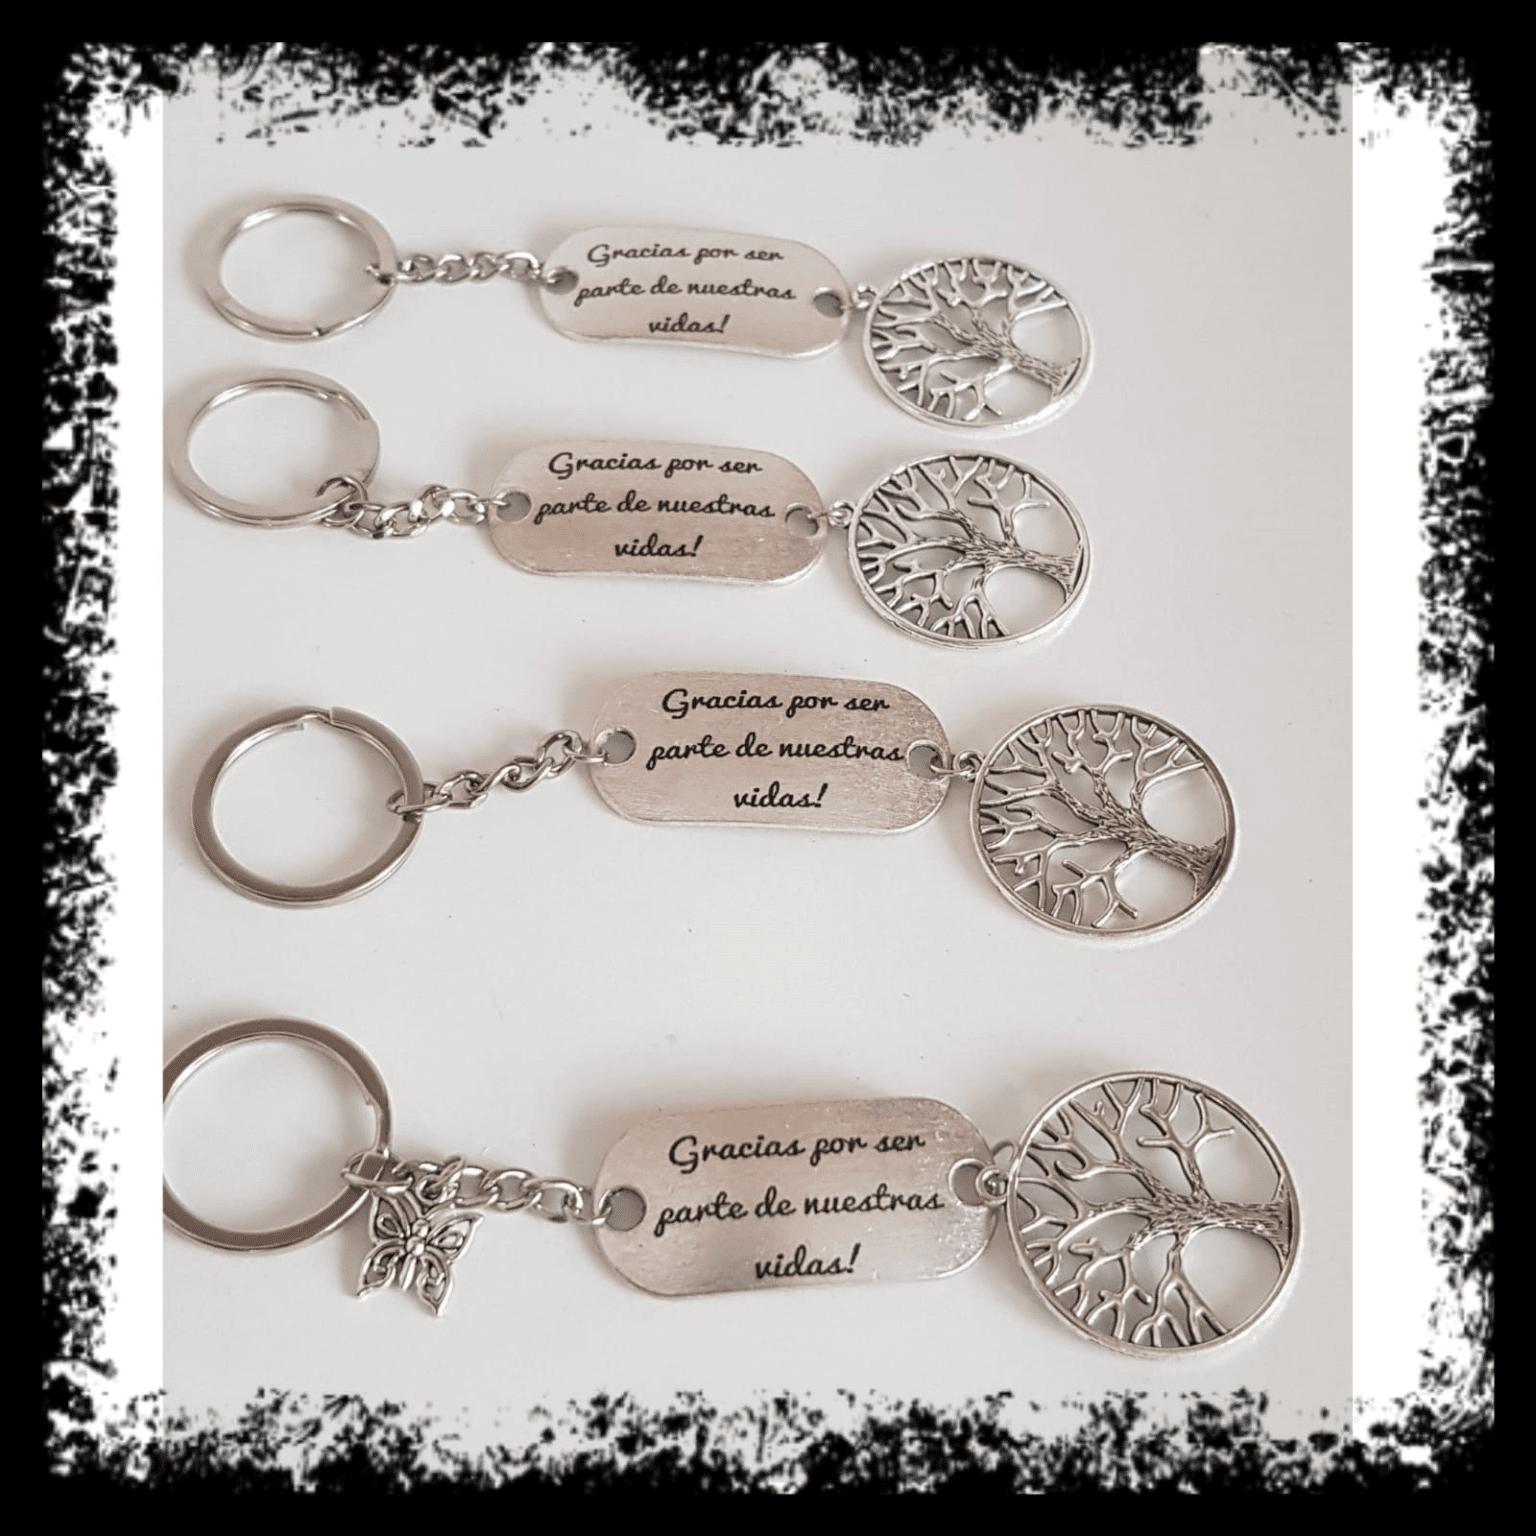 Detalles de Boda detalles de boda - regalos personalizados Llavero personalizado 6 - Detalles de Boda | Detalles para invitados